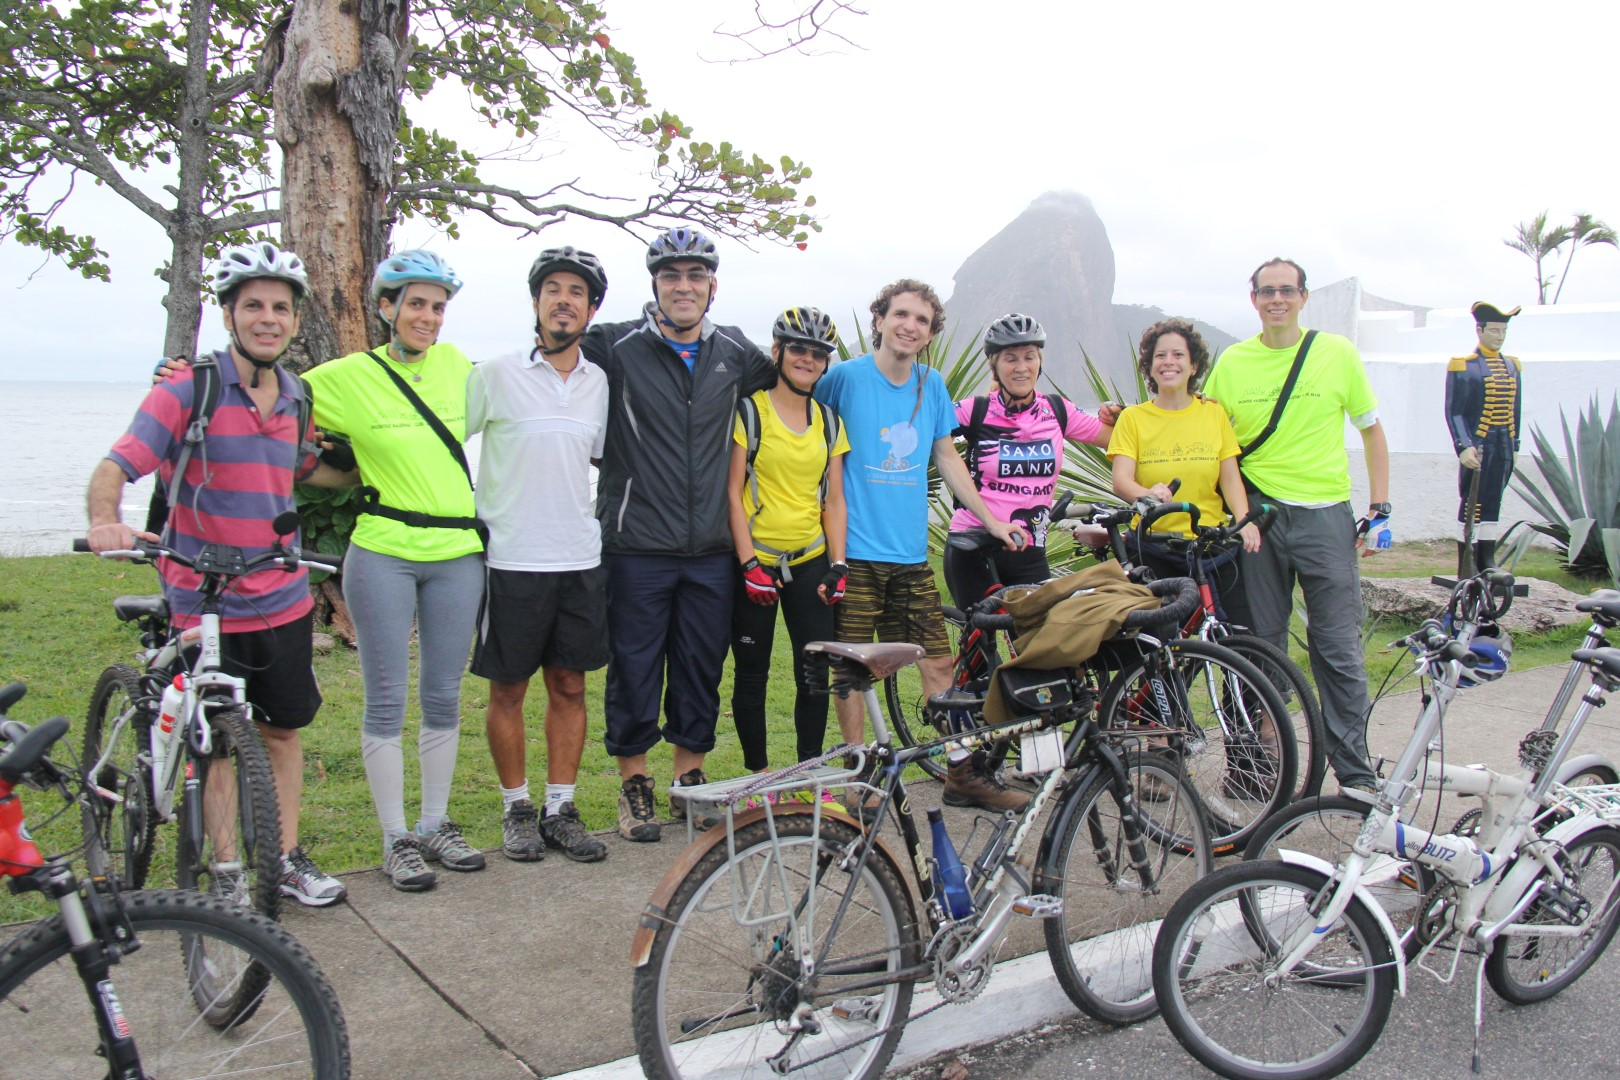 Último passeio de bicicleta por Niterói até a Fortaleza de Santa Cruz